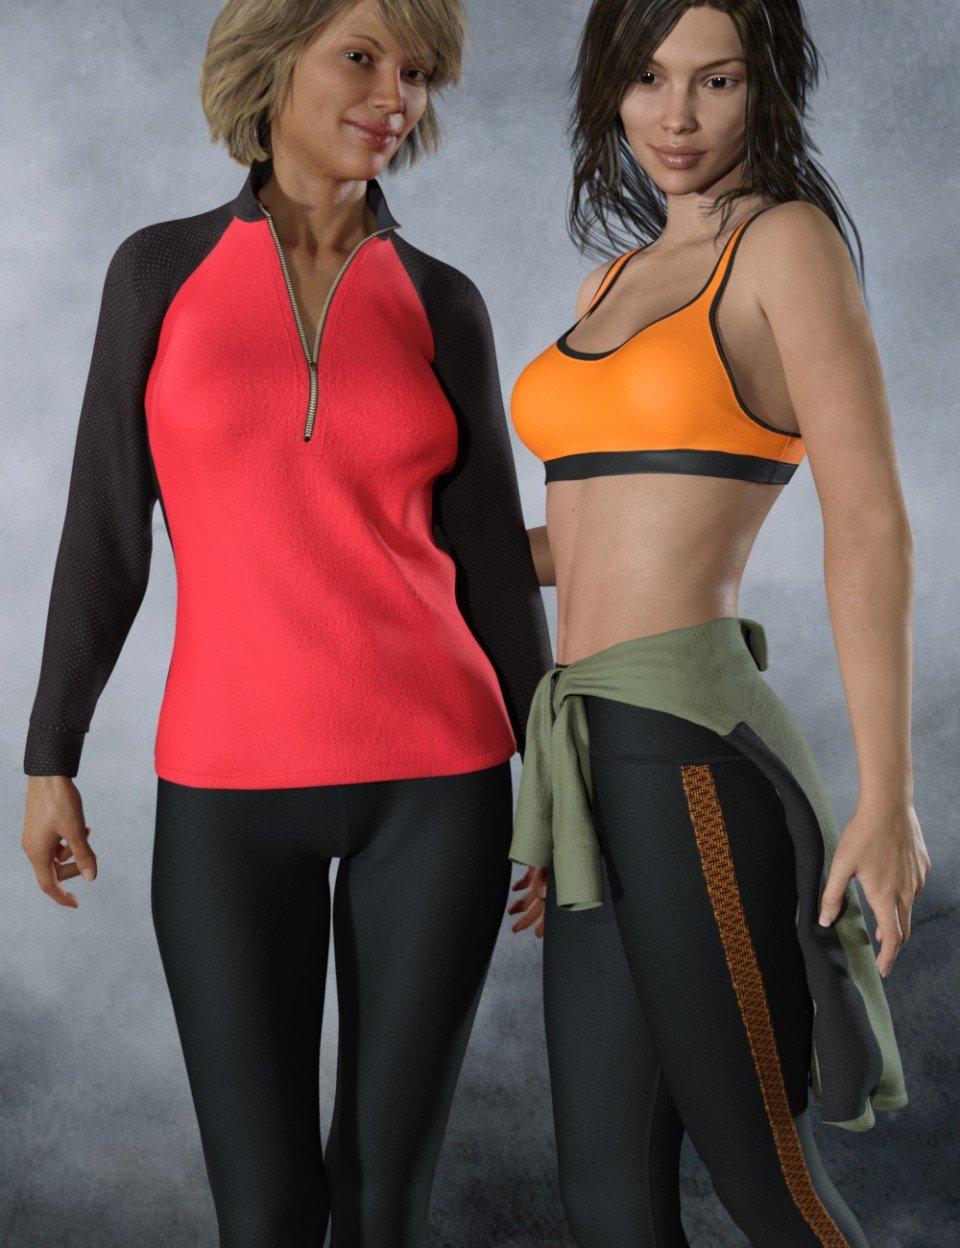 dForce Tek Athletic Apparel for Genesis 3 and 8 Female(s)_DAZ3D下载站